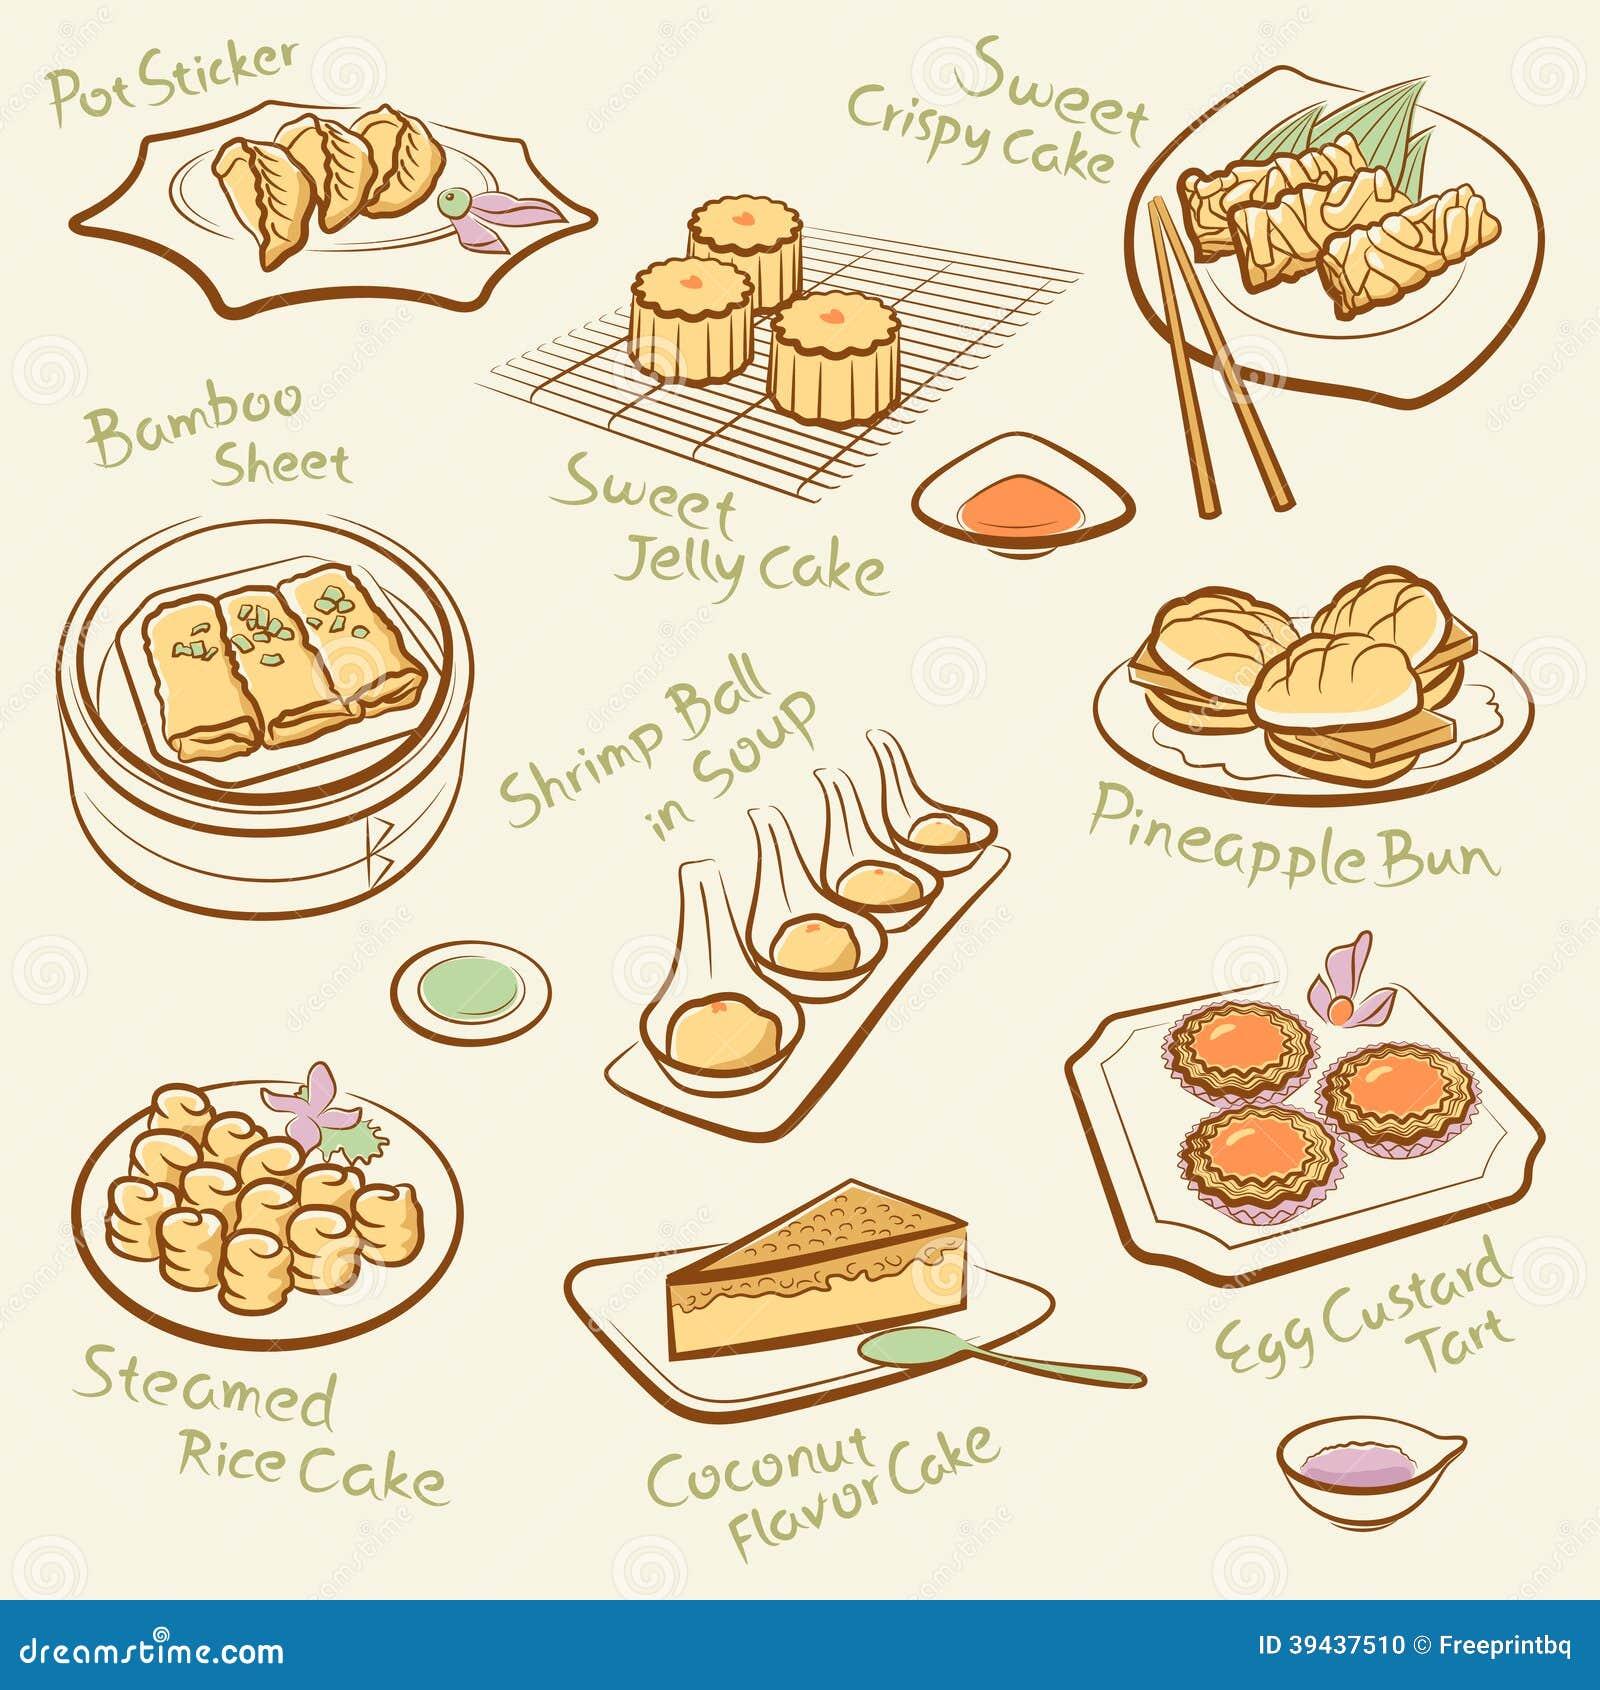 Easy Korean Rice Cake Recipe